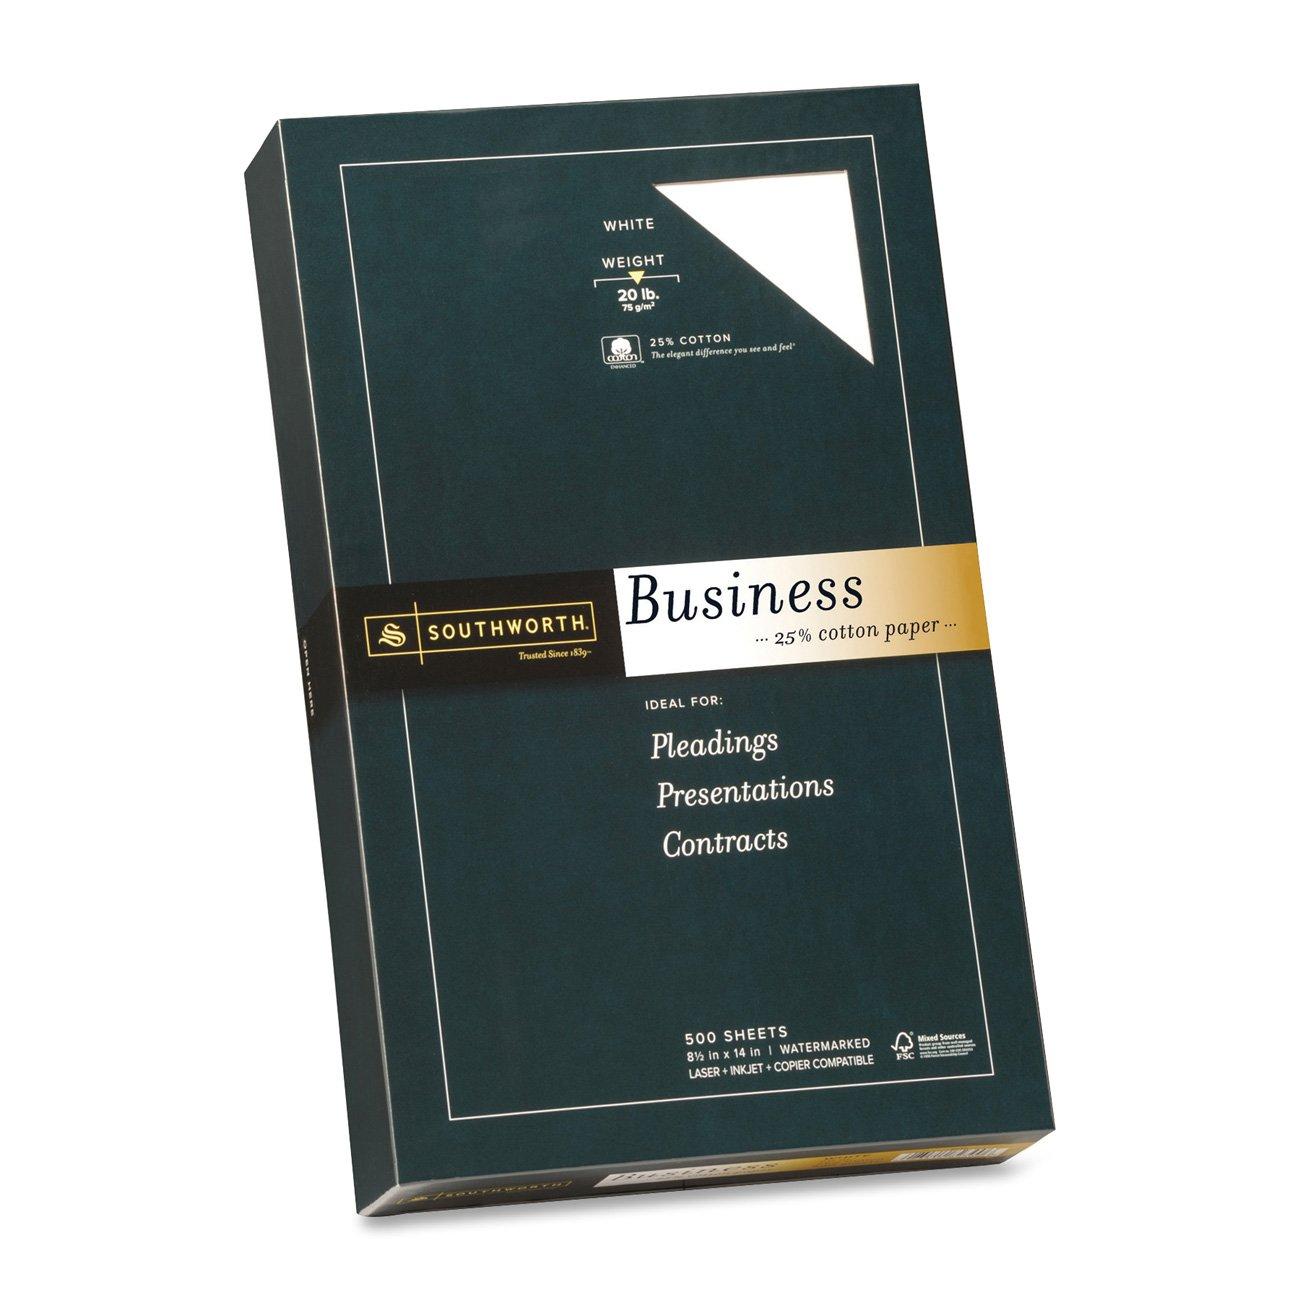 "Southworth 25% Cotton Business Paper, 8.5"" x 14, 20 lb/75 gsm, Wove Finish, Diamond White, 500 Sheets (403E)"